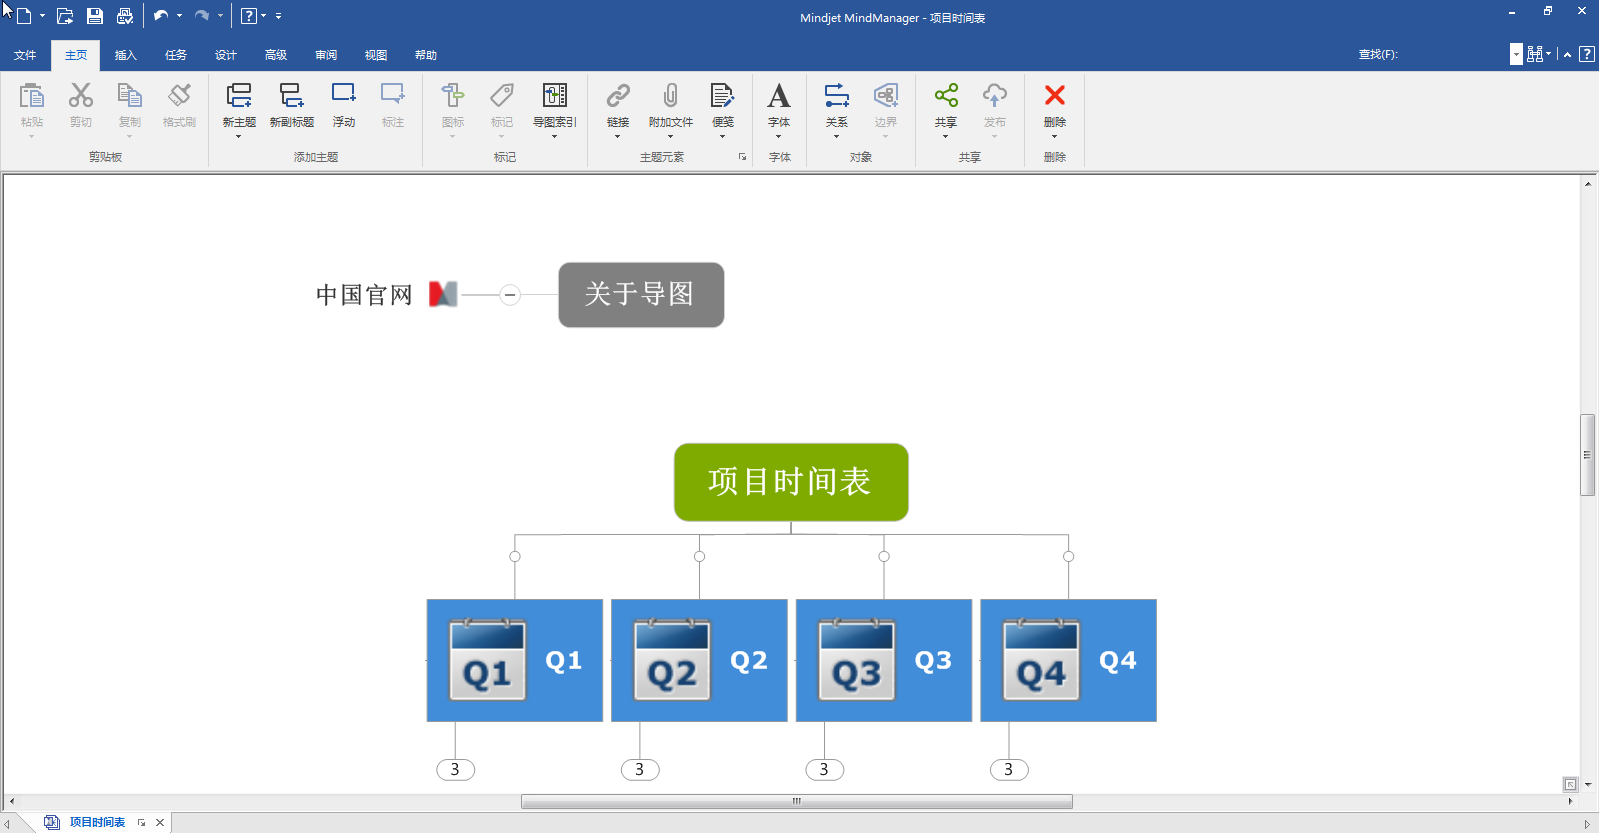 MindManager 2018思维导图软件中文版 中文版下载